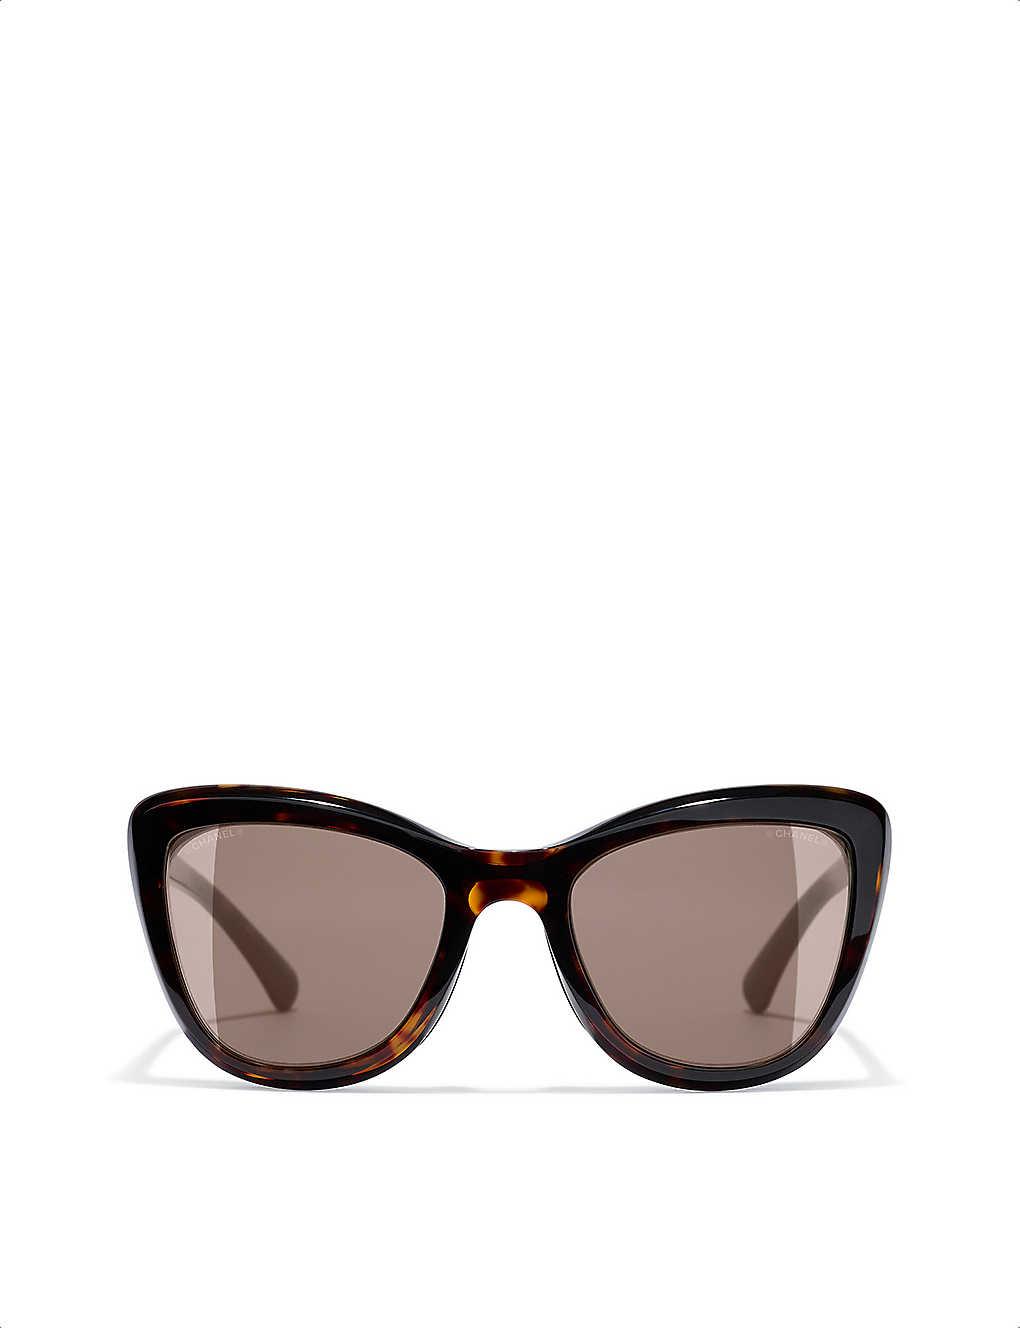 cc1ee6b3b4c5 CHANEL - Clip On sunglasses | Selfridges.com